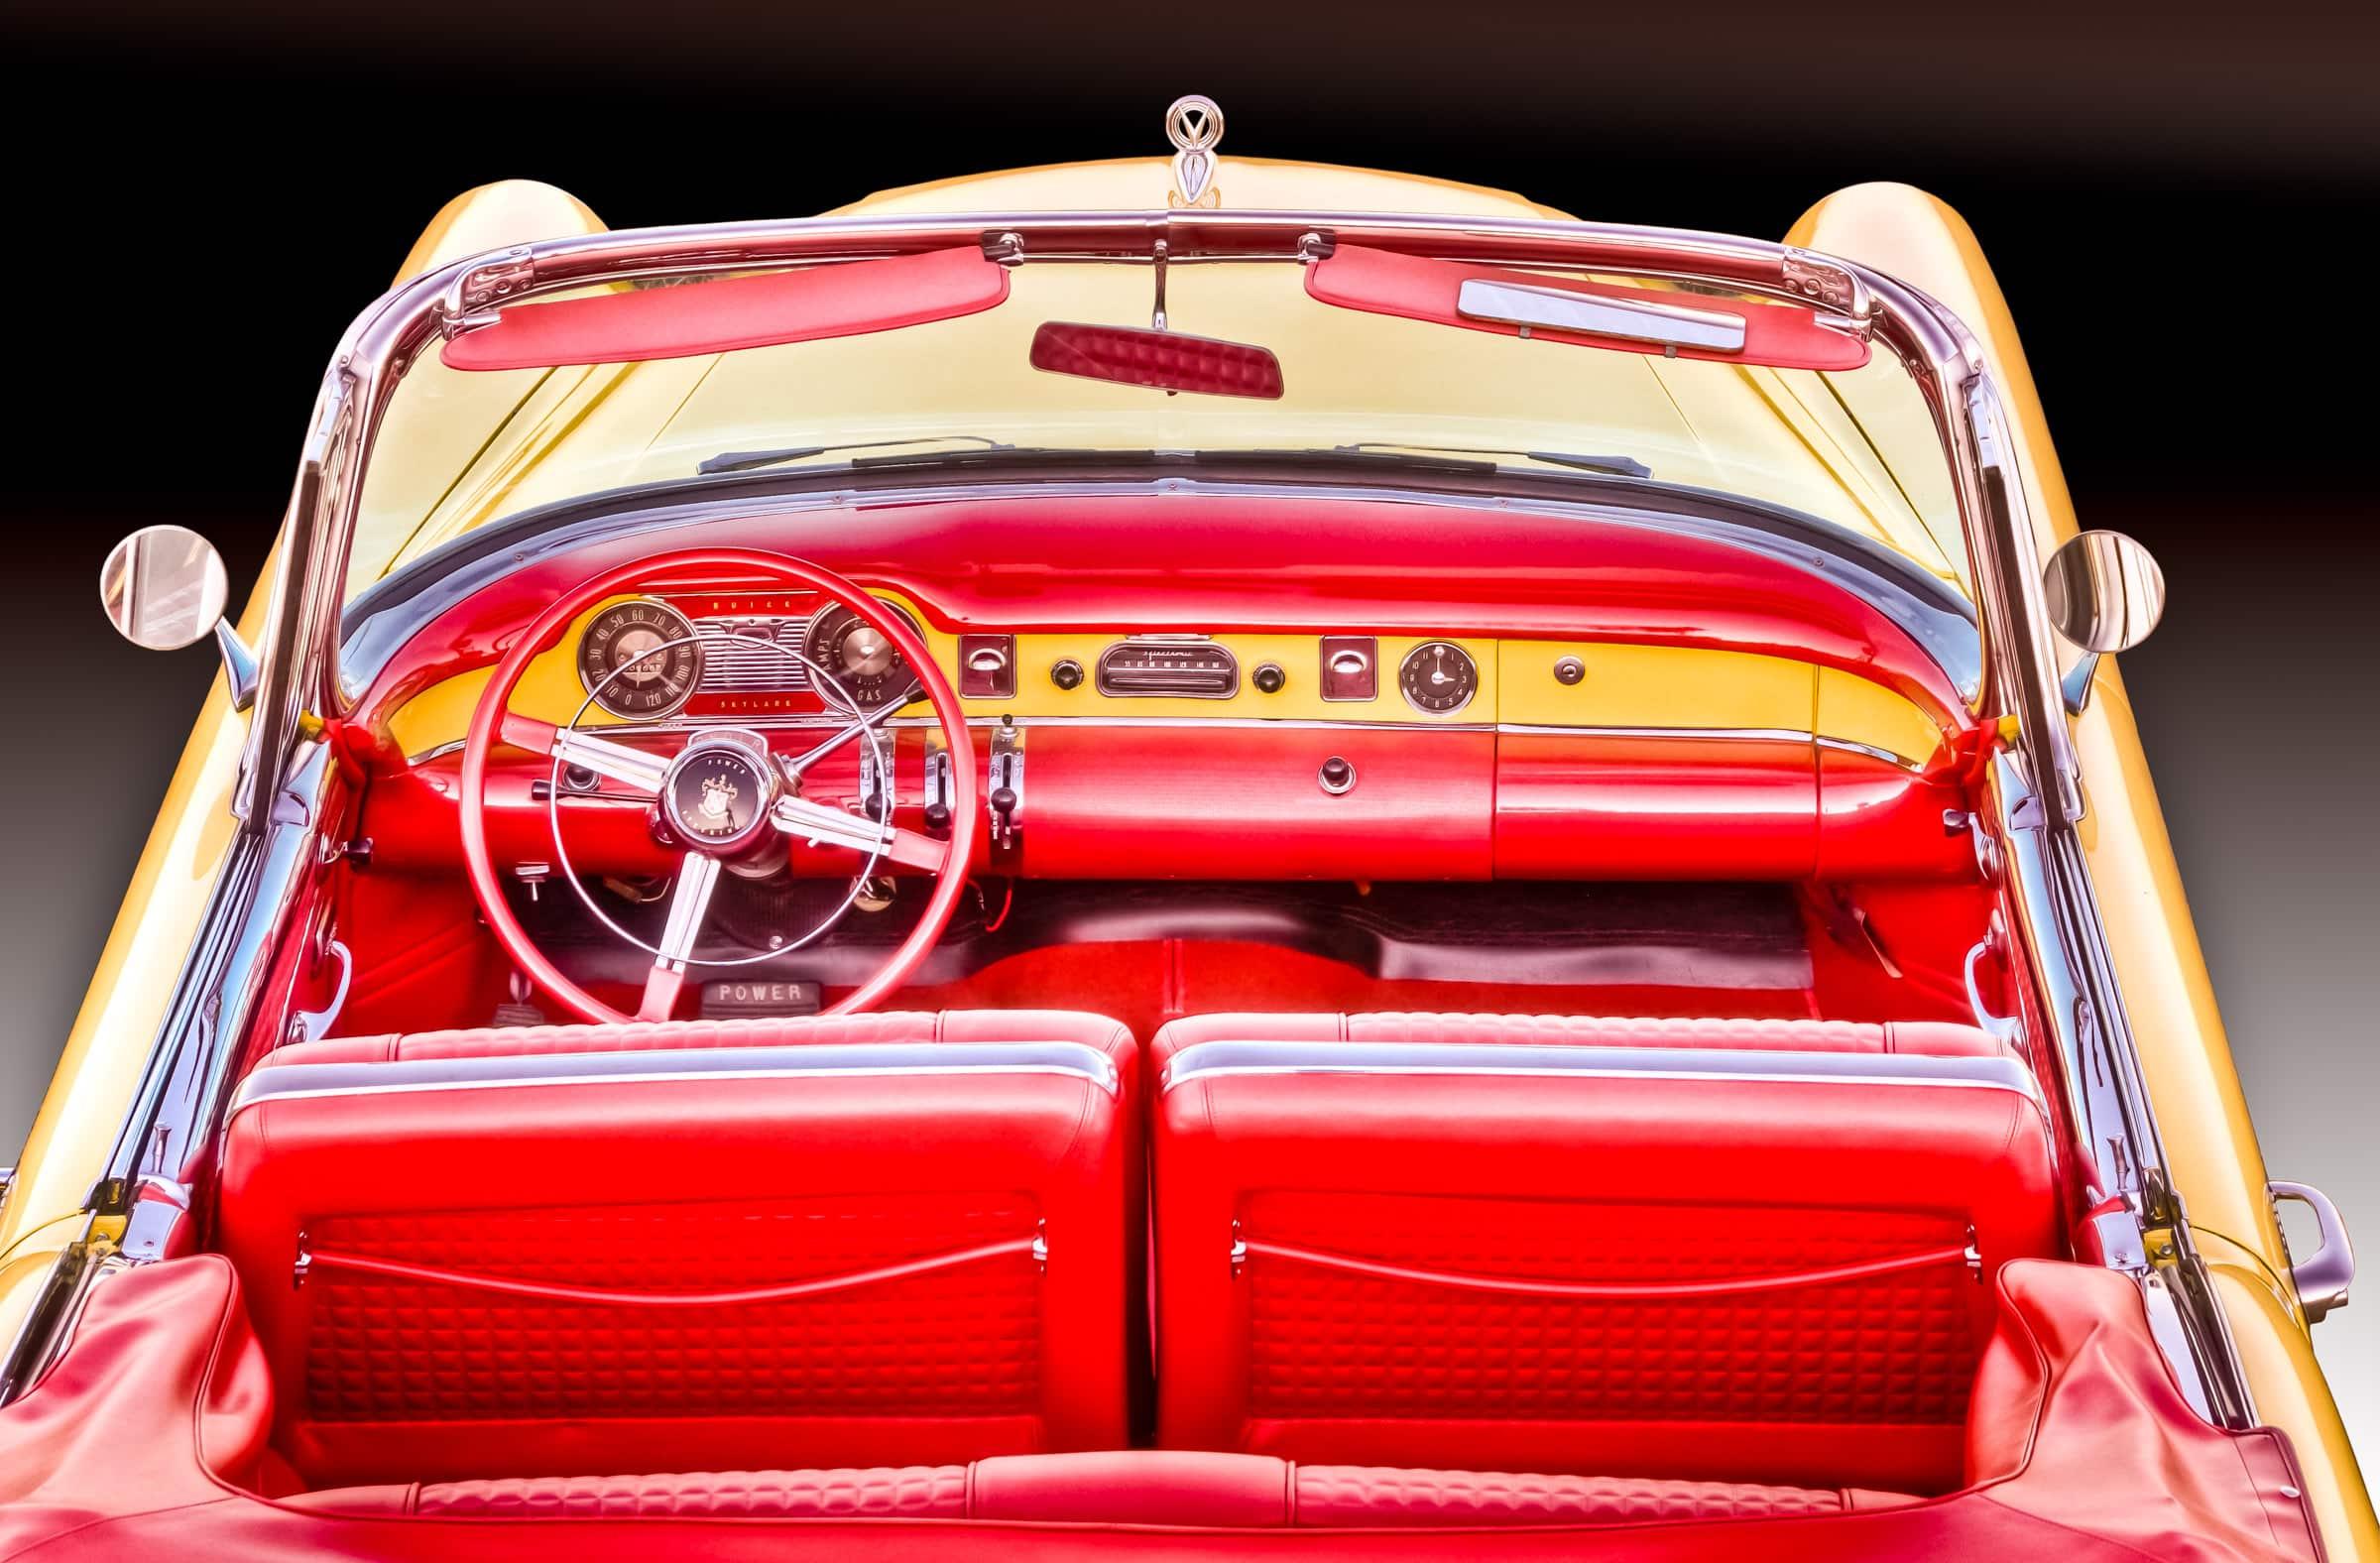 1954 Buick Skylark Sport Convertible - Yellow